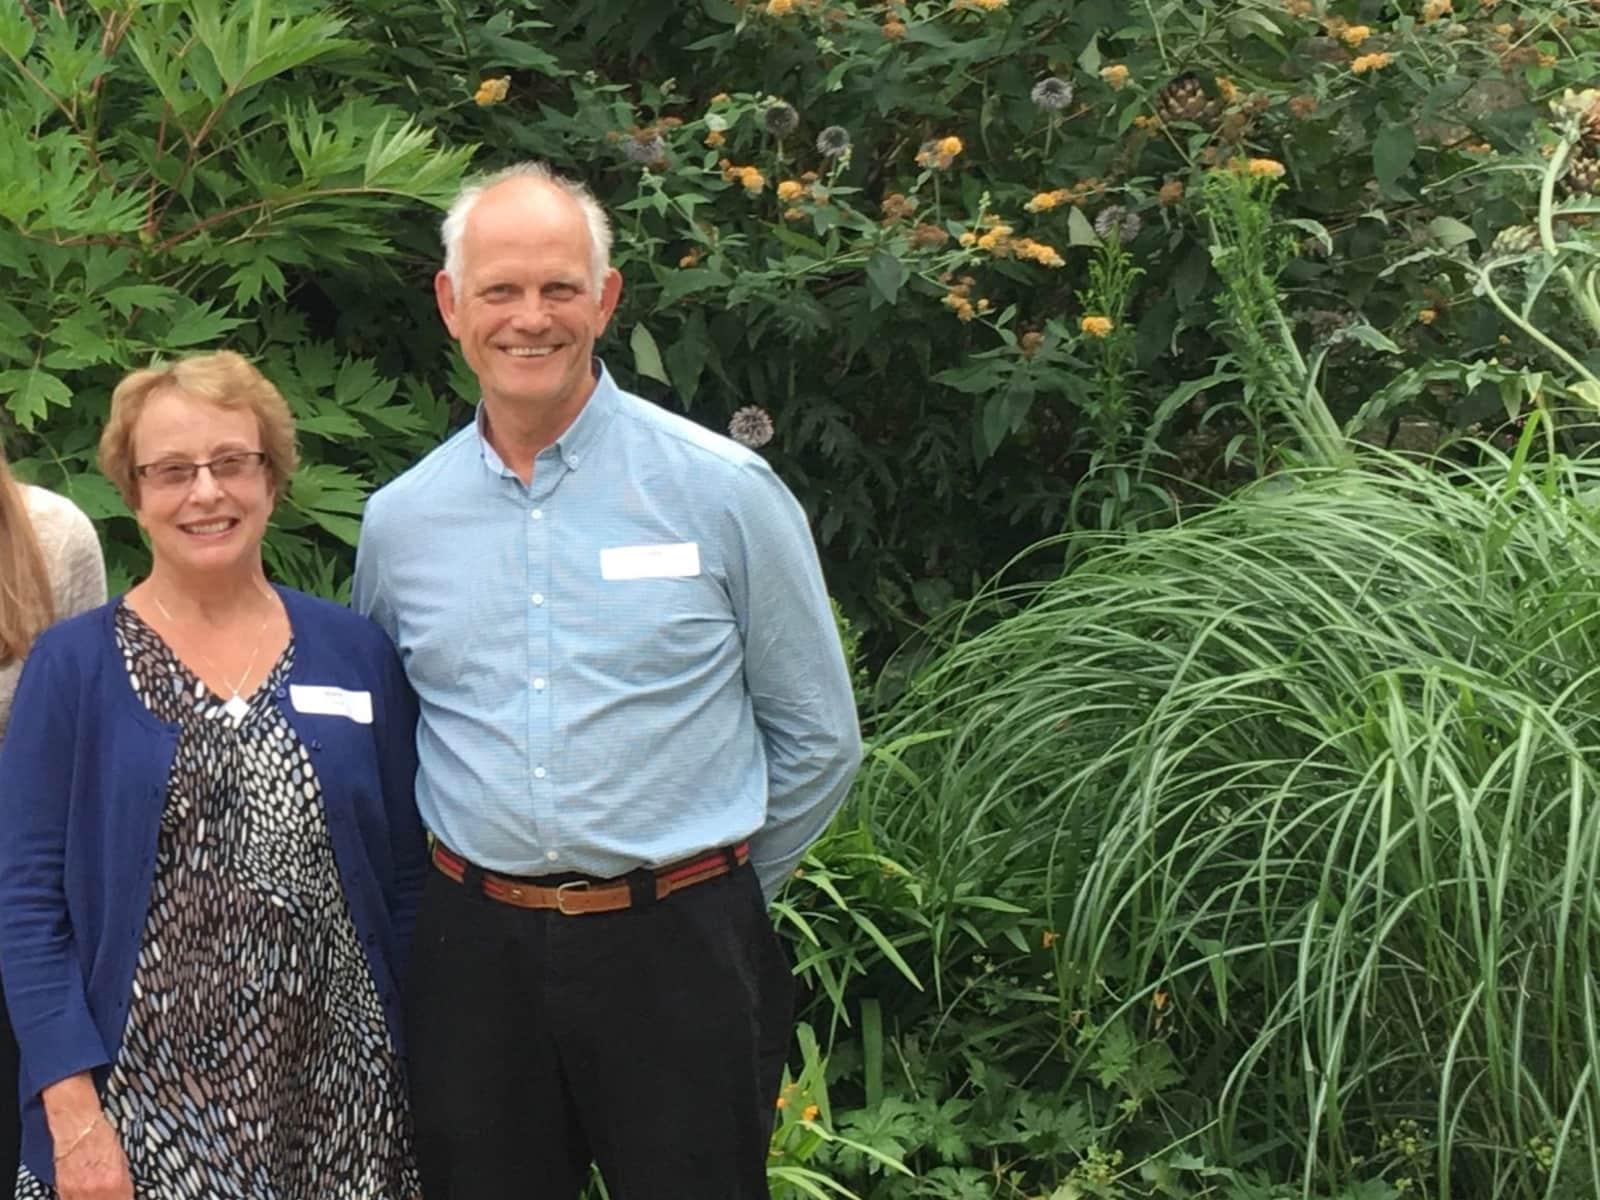 Mary & Grady (gerhardus) from Hobart CBD, Tasmania, Australia